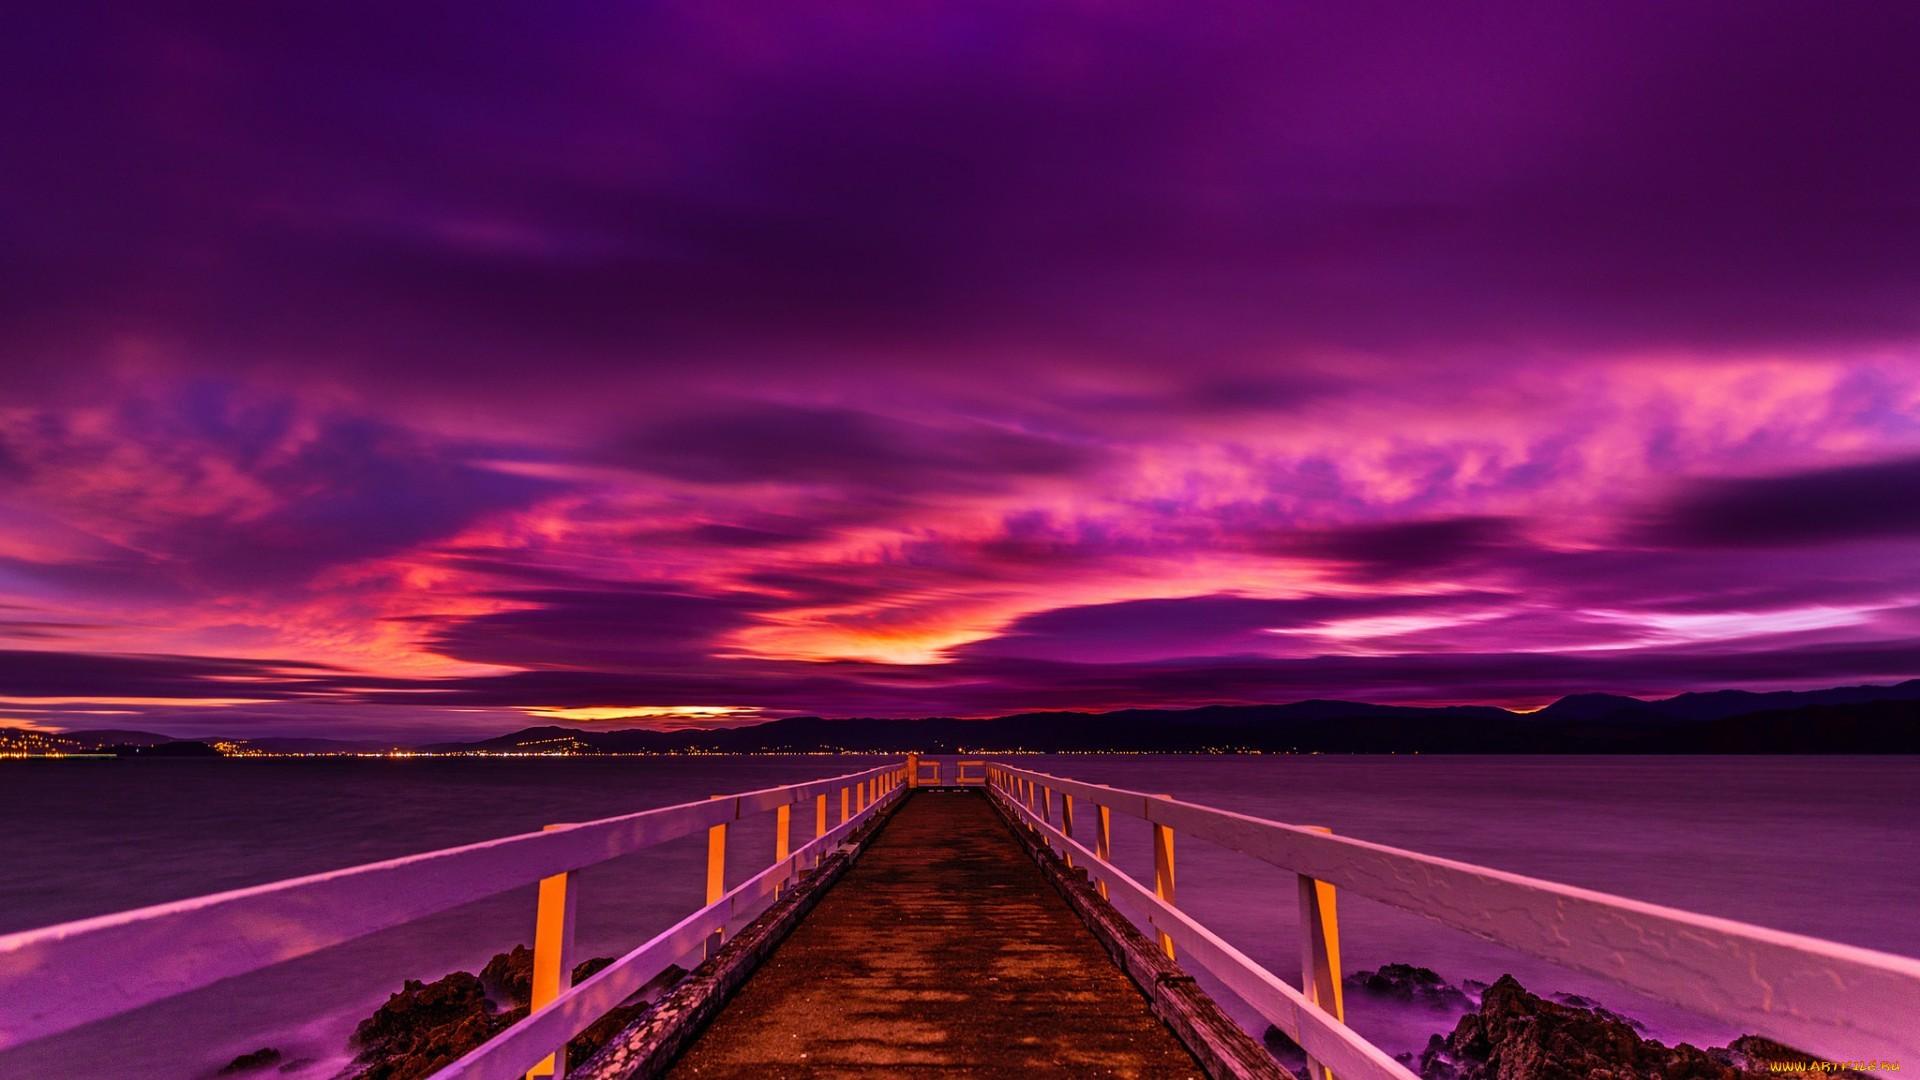 Purple Sunset PC Wallpaper